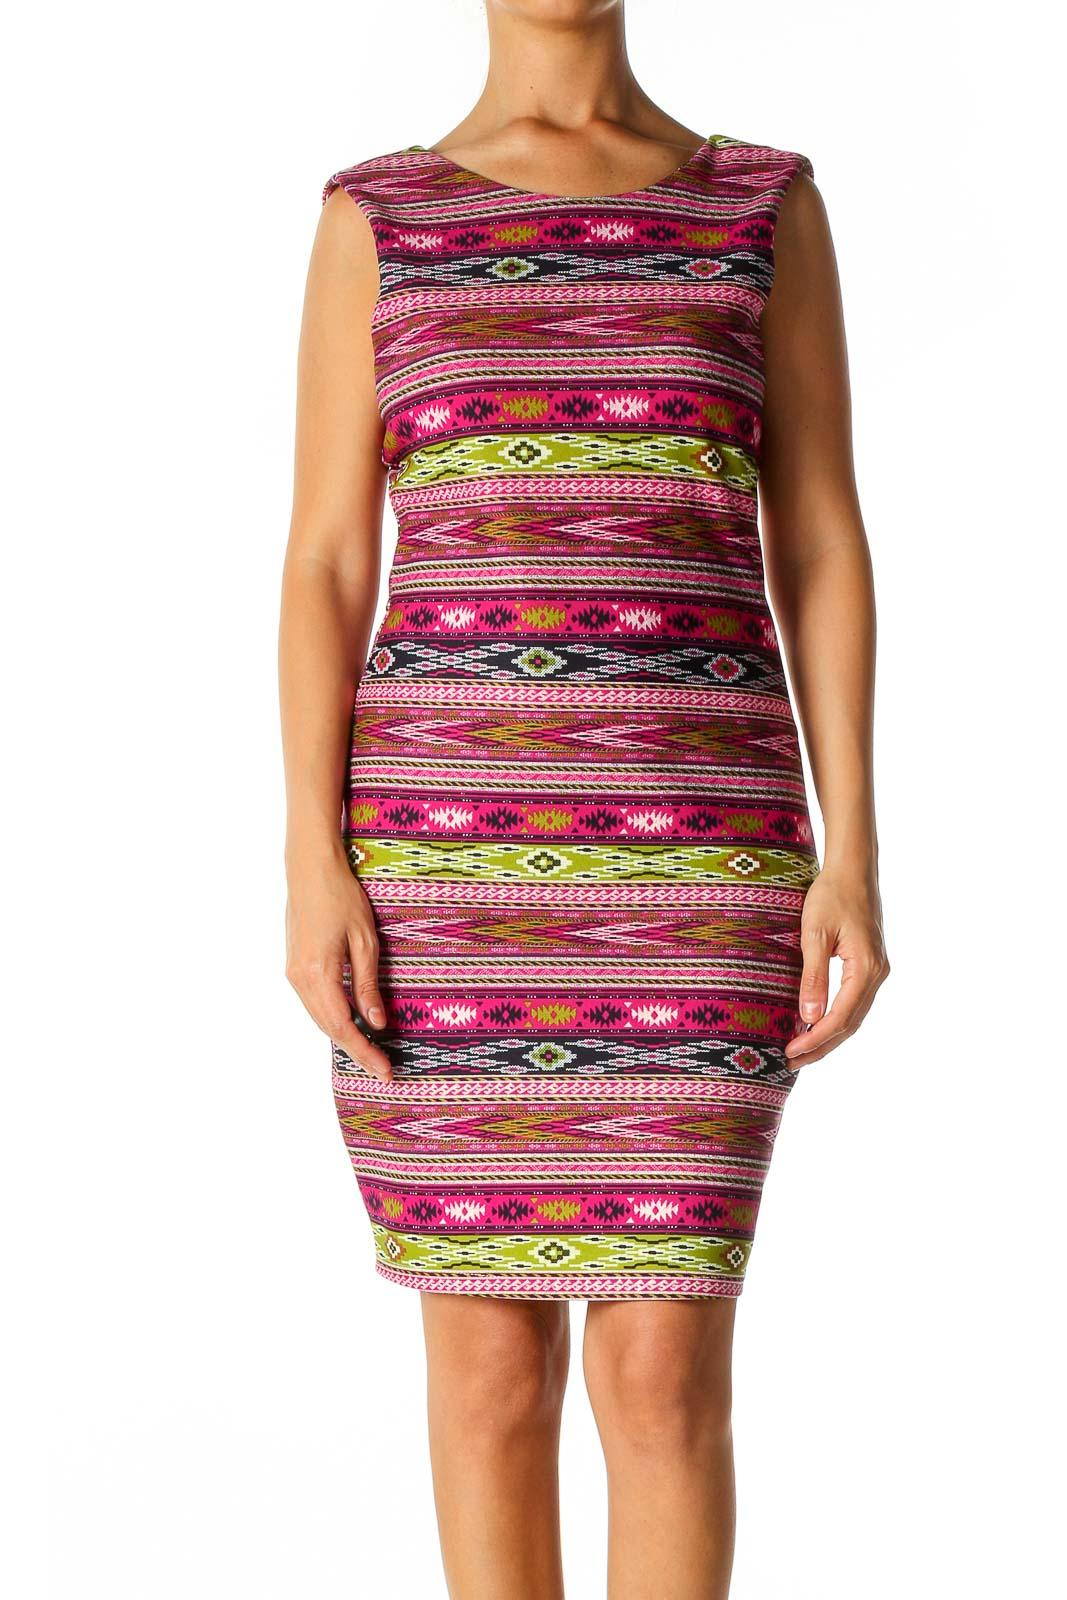 Pink Aztec Print Casual Sheath Dress Front